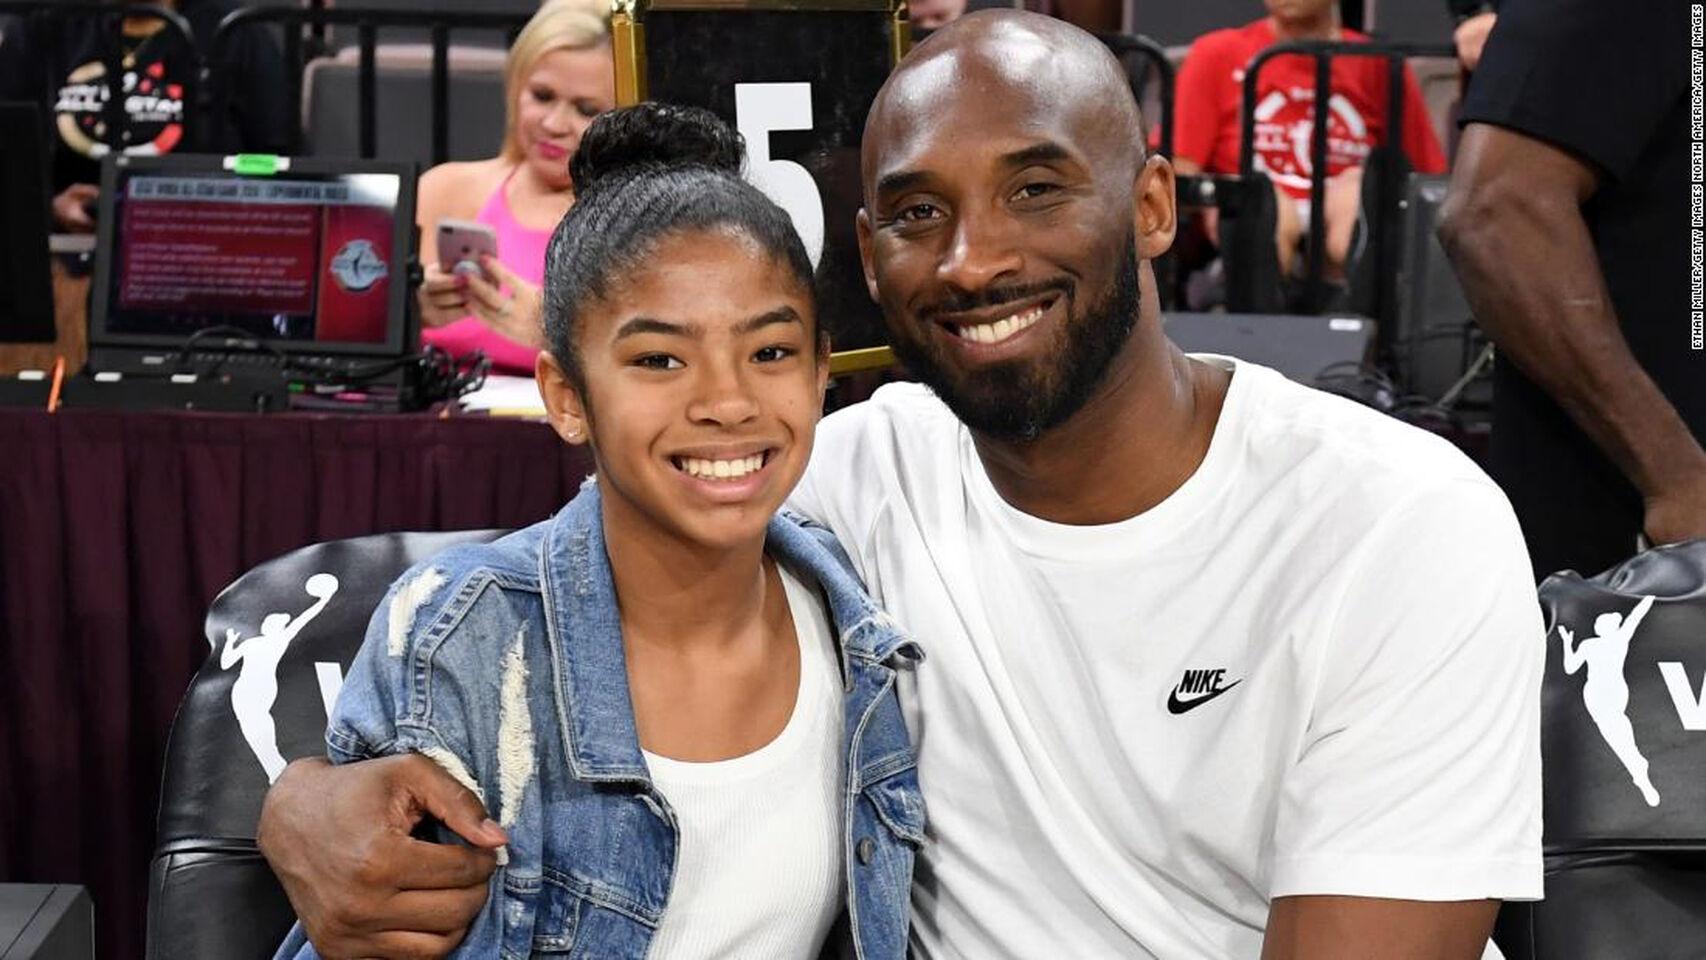 Photo of Gianna Maria hija de Kobe Bryant murió junto a su padre en accidente aéreo